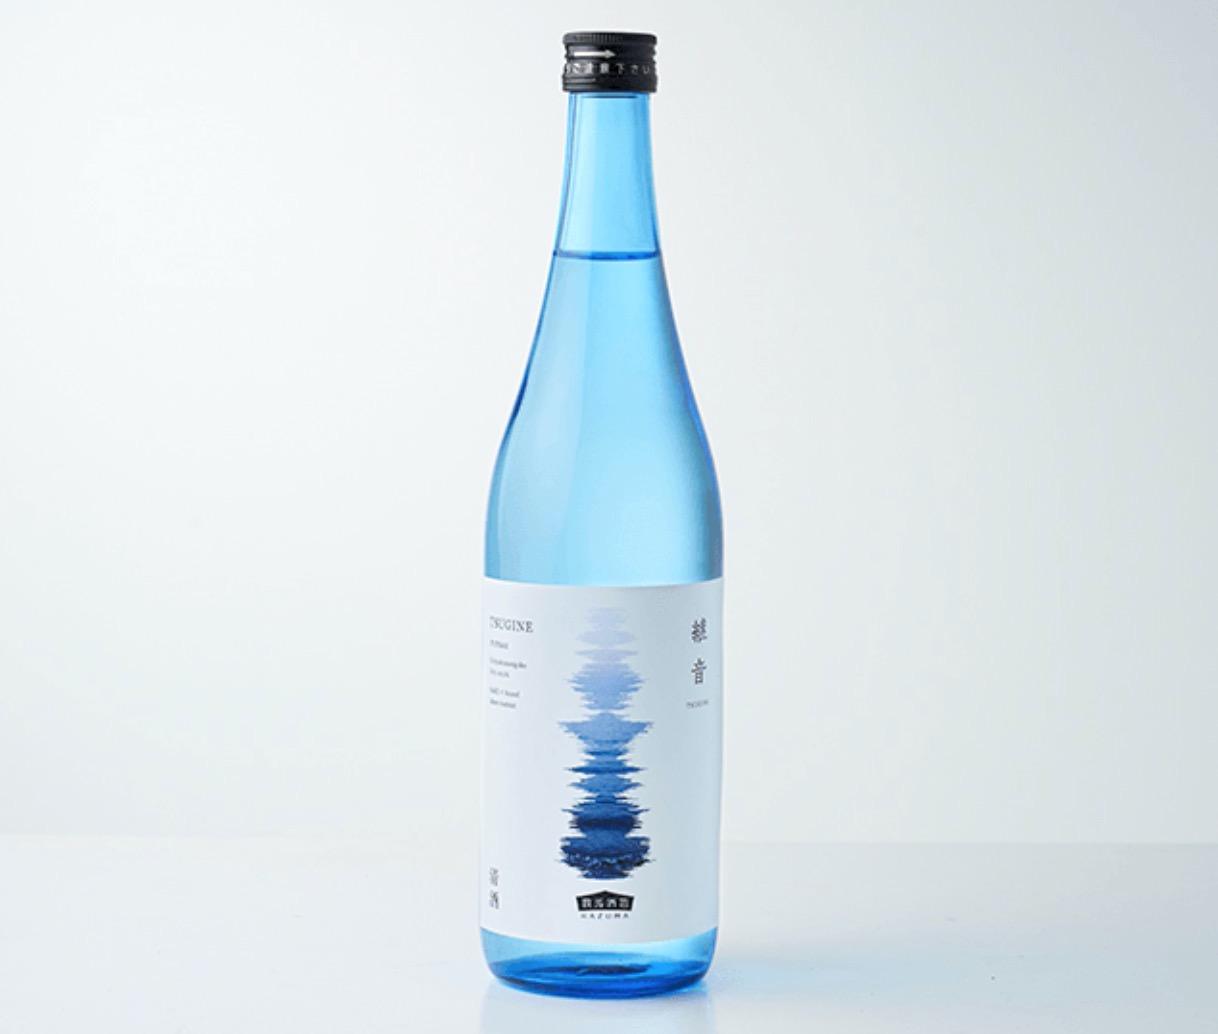 PFUの音響識別AI技術を活用して「歓びの声」だけ聞かせたAI日本酒「継音」プロジェクトのクラウドファンディングが開始